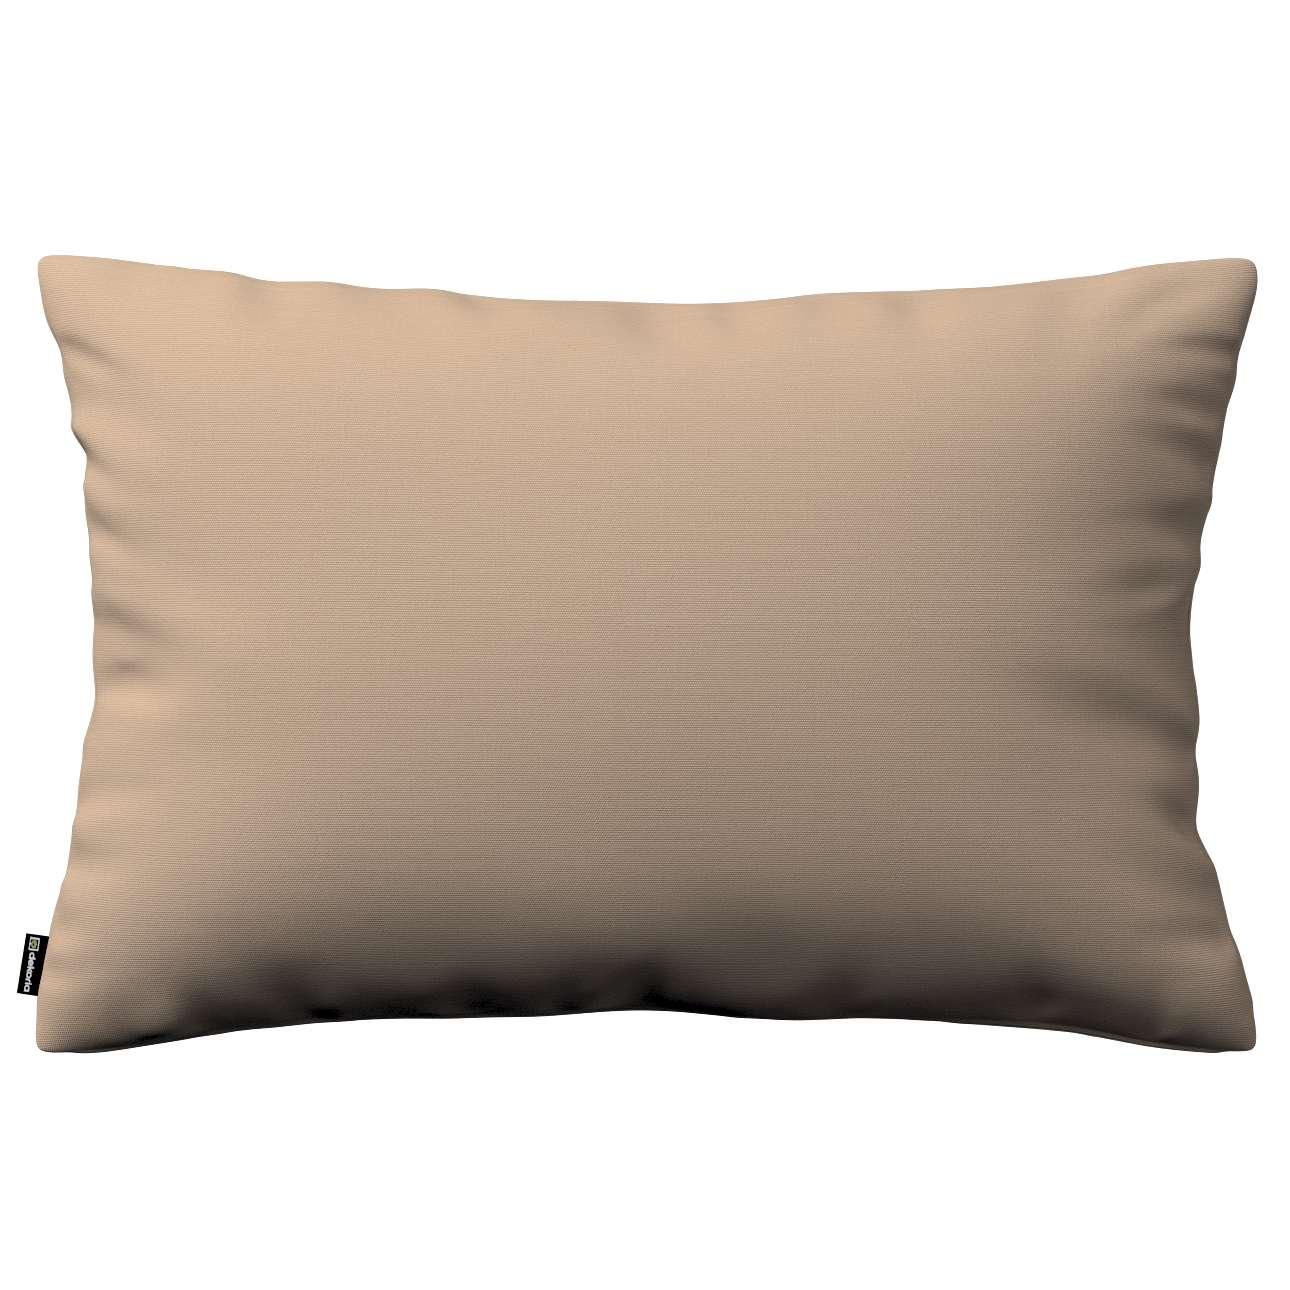 Kissenhülle Kinga 60x40cm 60x40cm von der Kollektion Cotton Panama, Stoff: 702-28